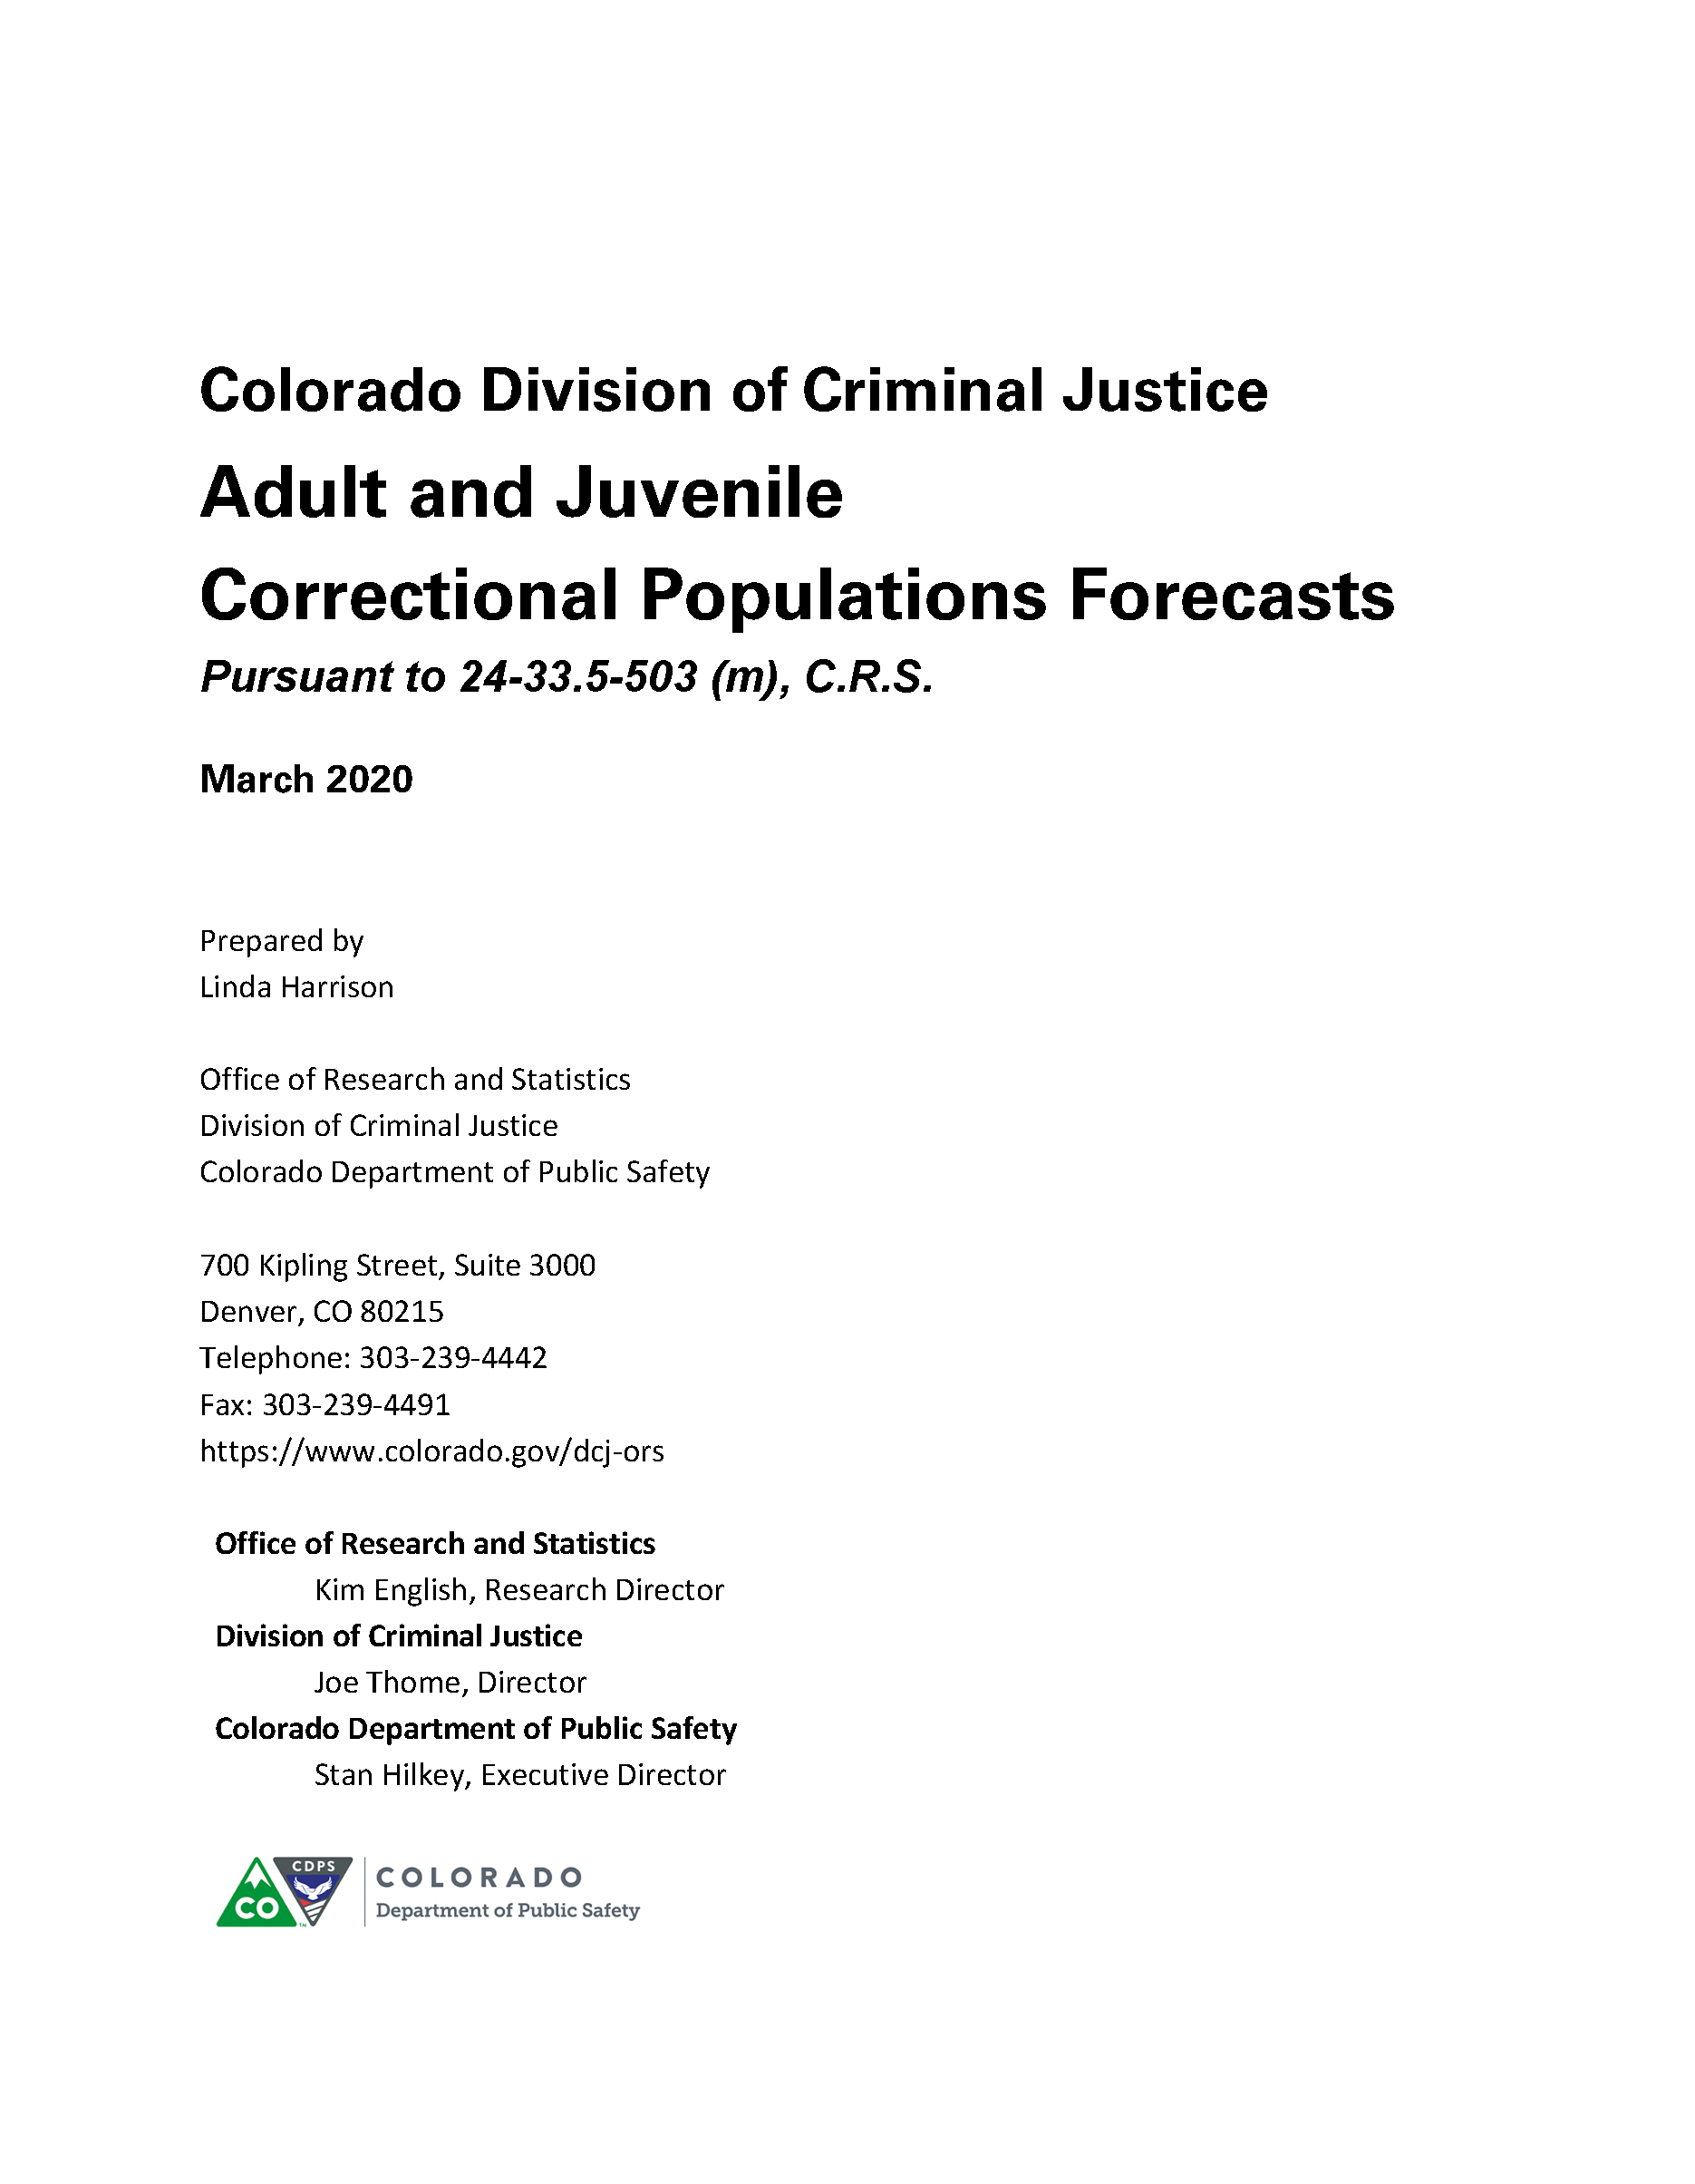 Correctional Population Forecasts, FY 2020